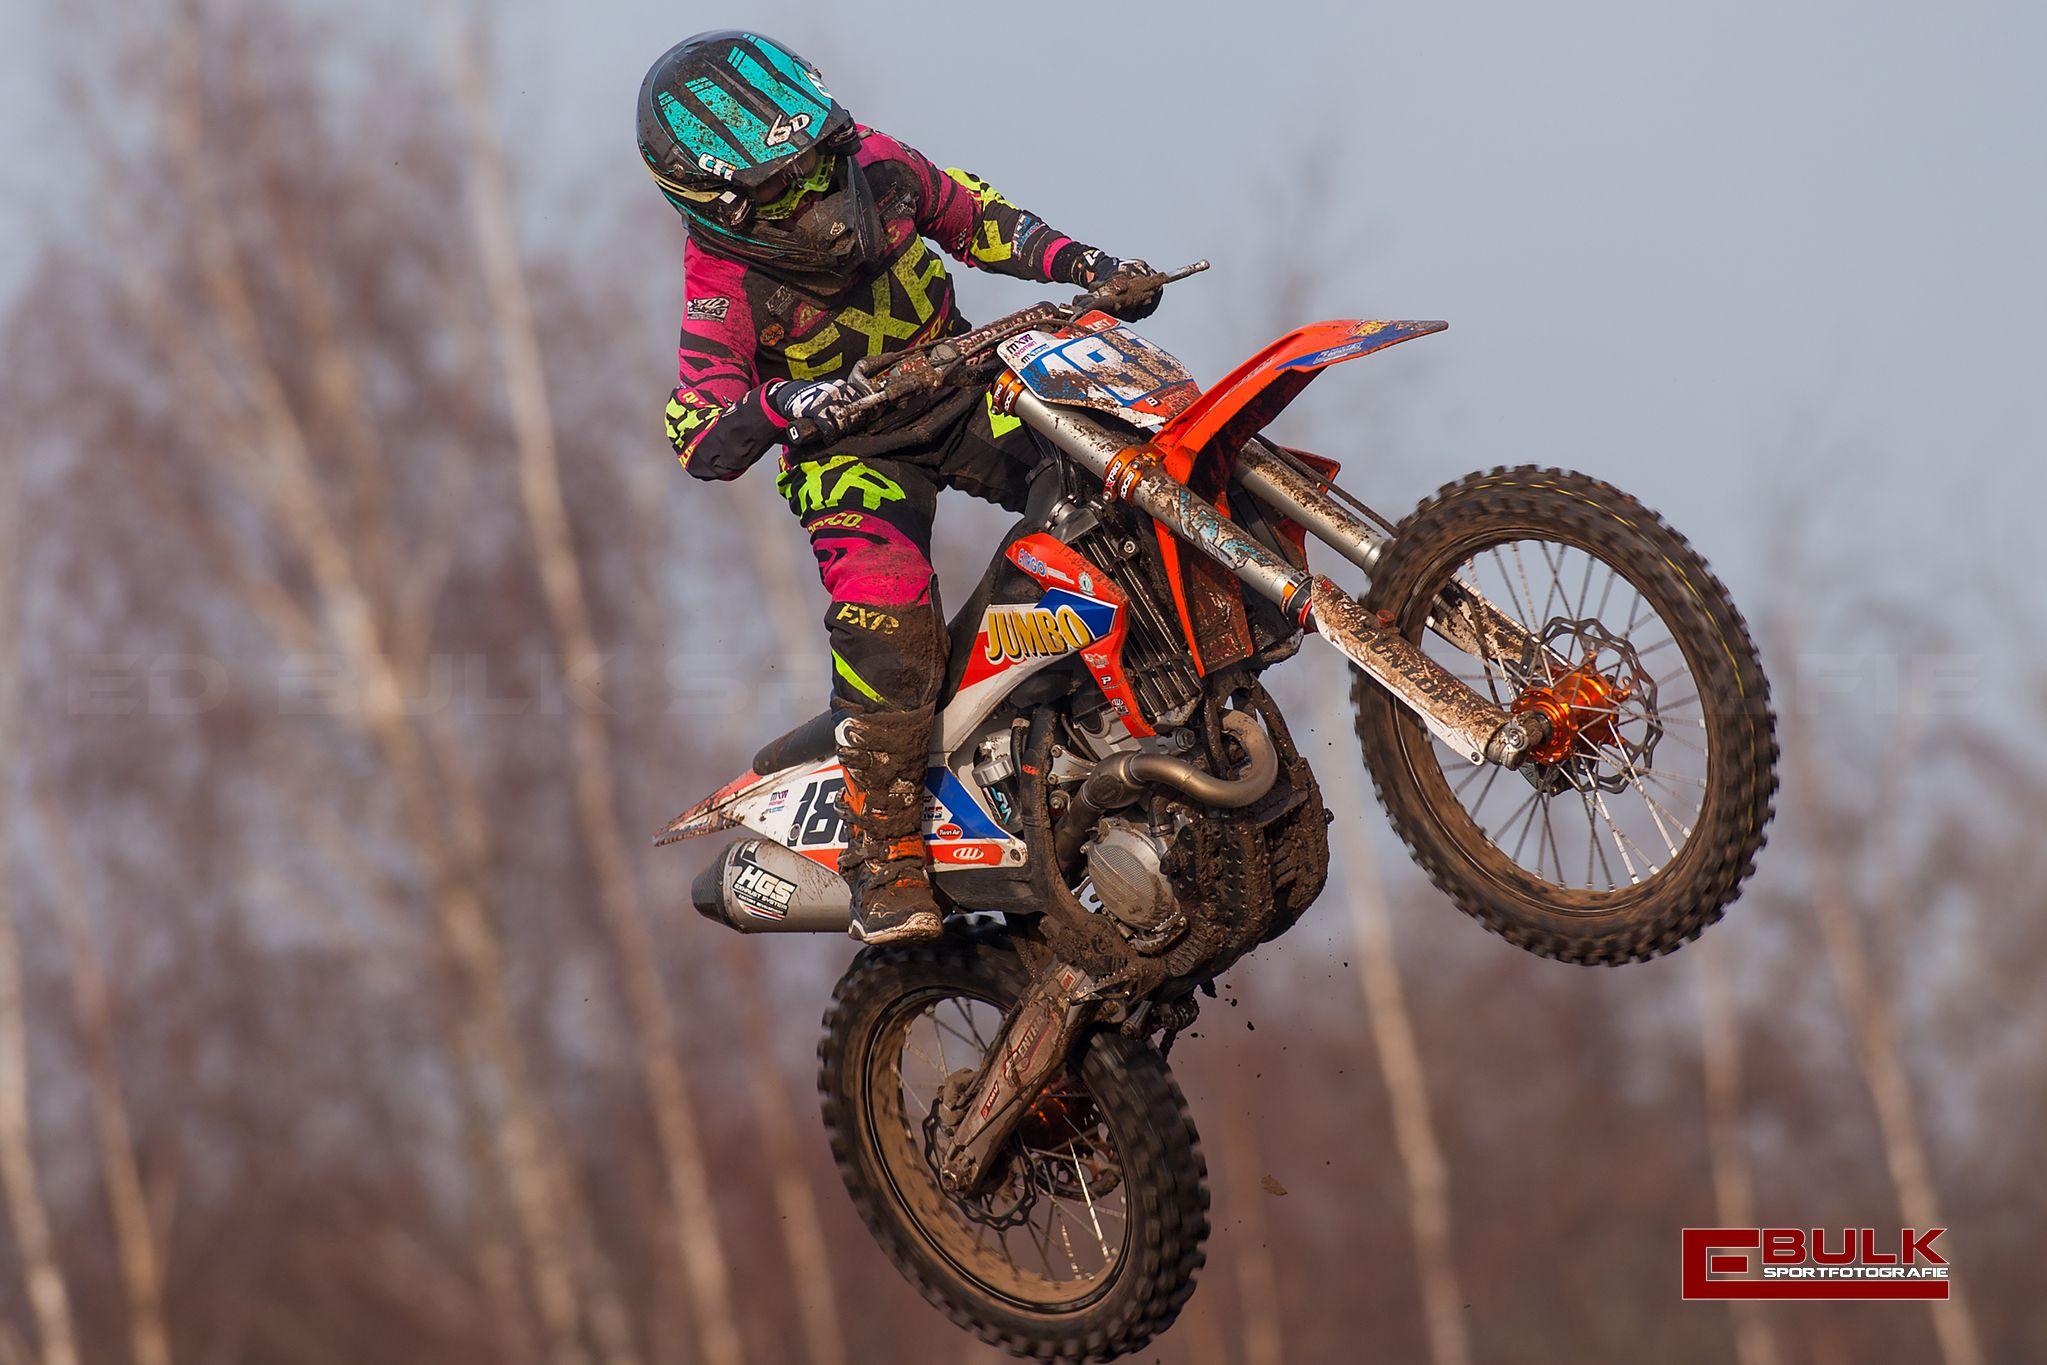 ebs_0823-ed_bulk_sportfotografie